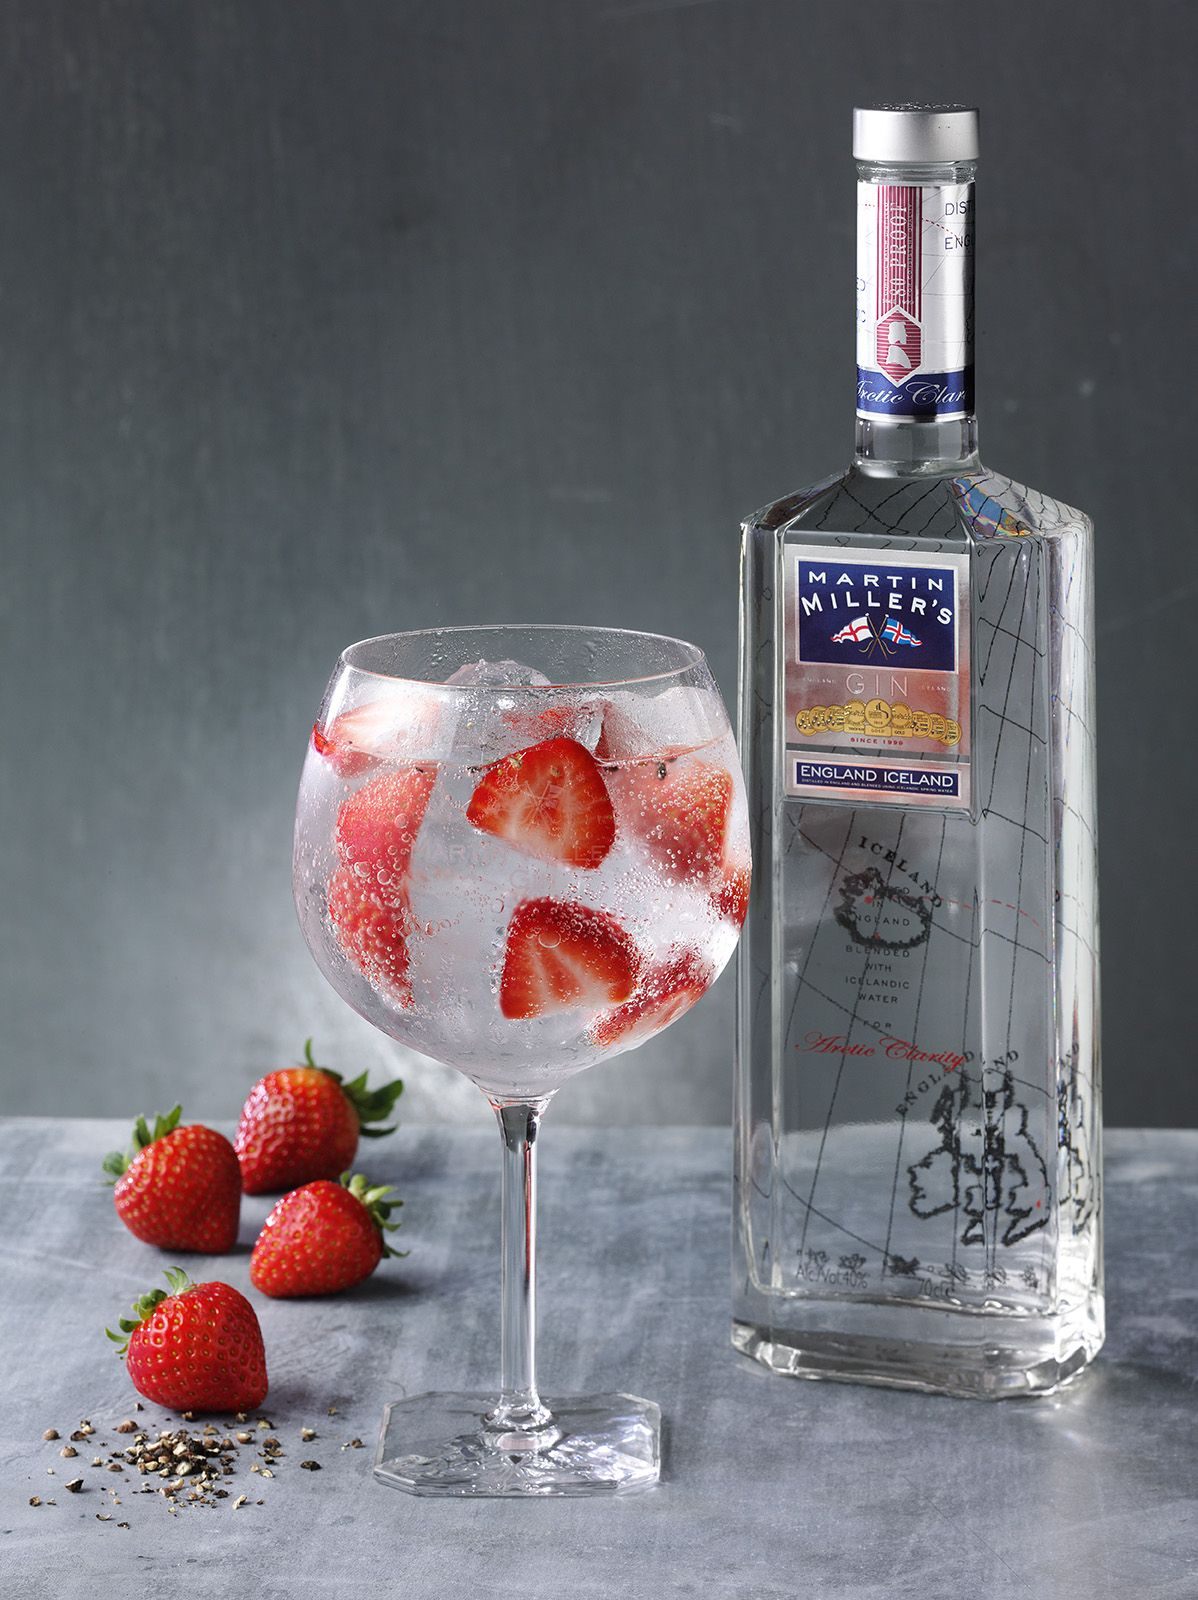 Martin Miller S Gin Cocktail Glasses